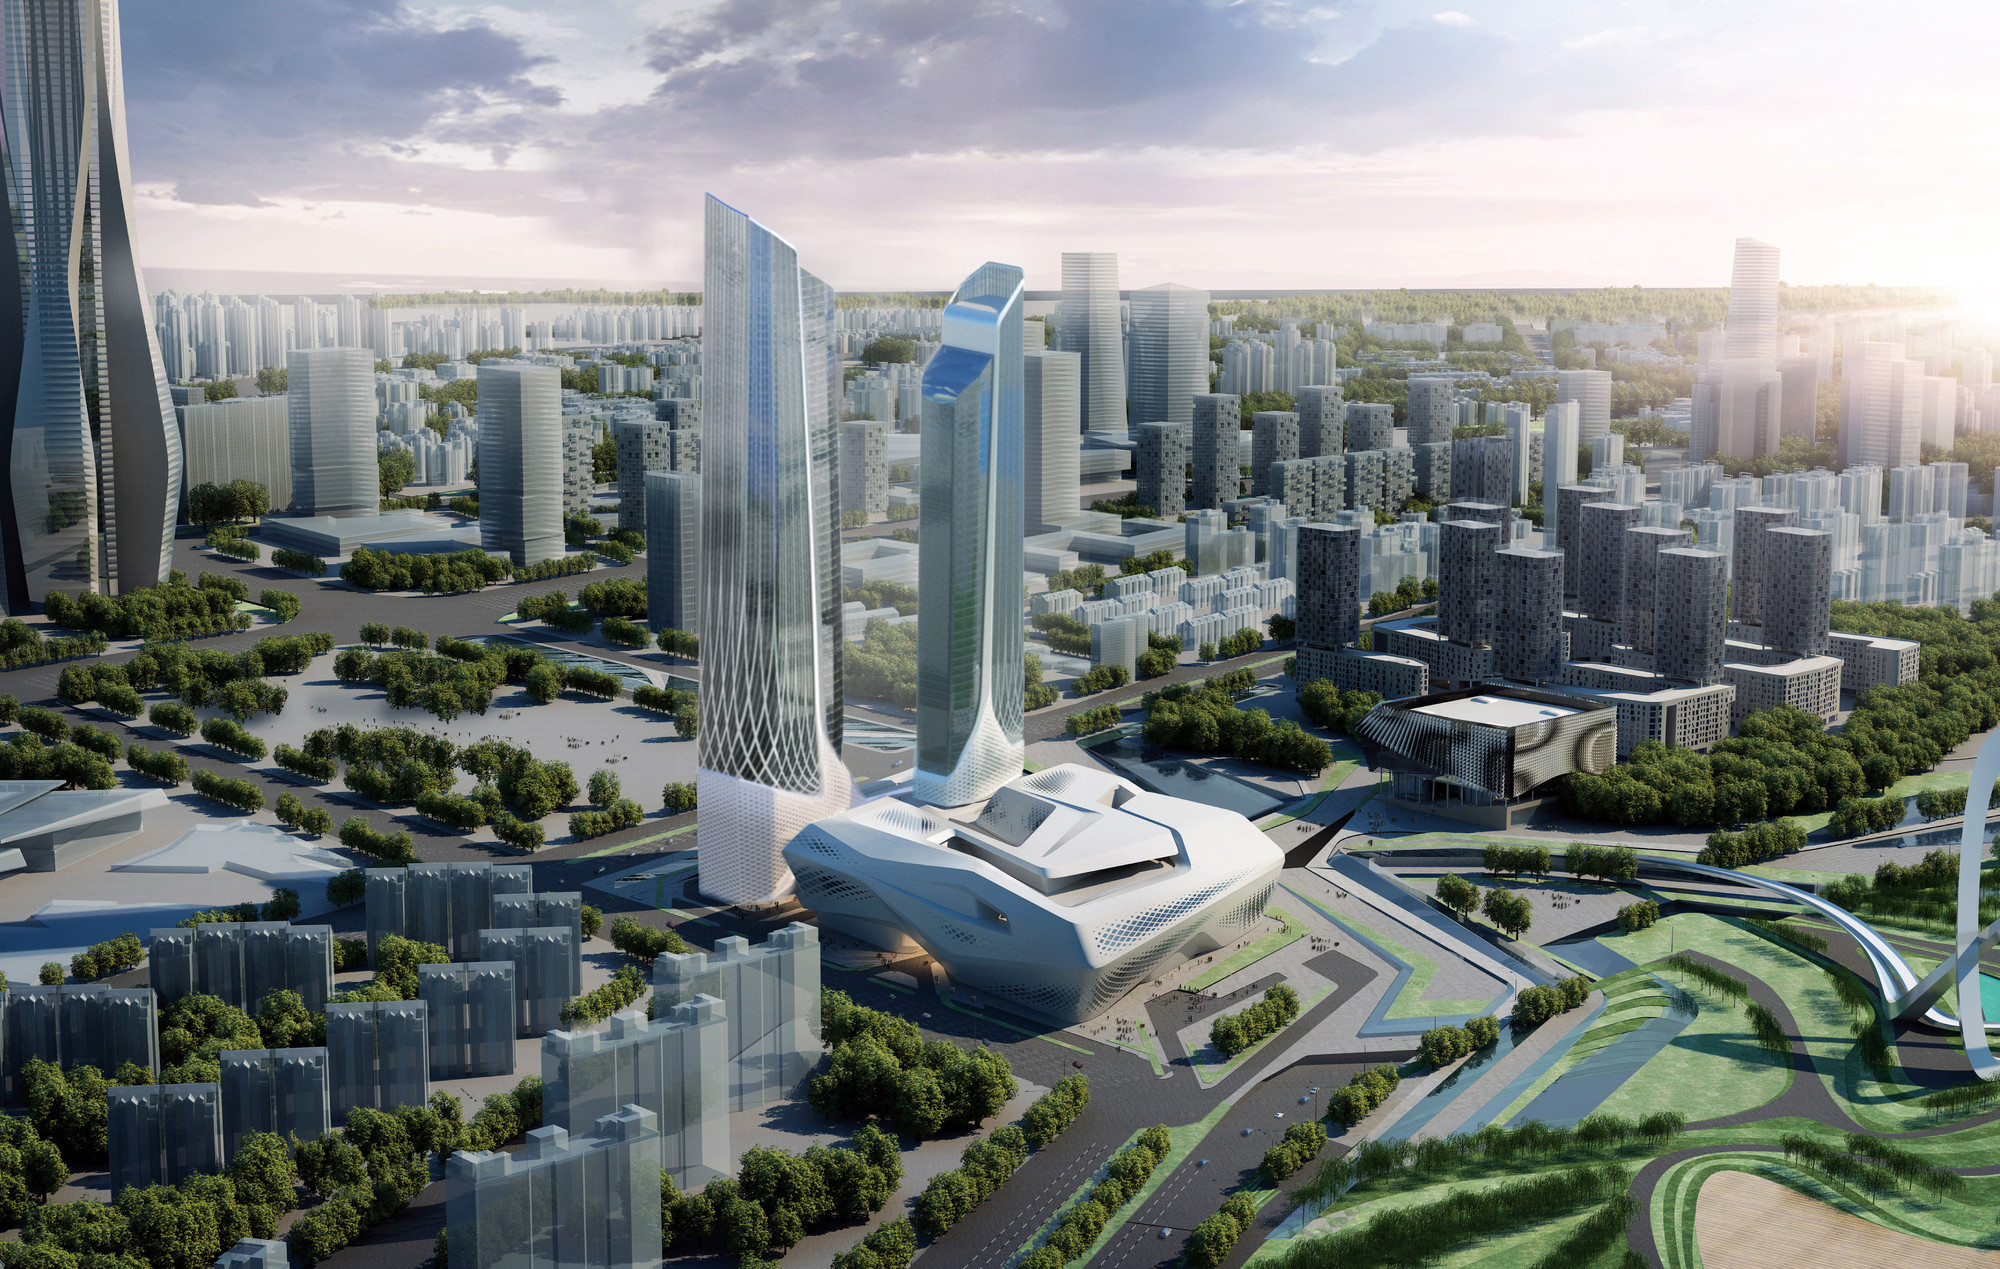 Zaha Hadid y Norman Foster diseñarán hoteles de lujo en China , Jumeirah Nanjing. Image cortesía de Jumeirah Group